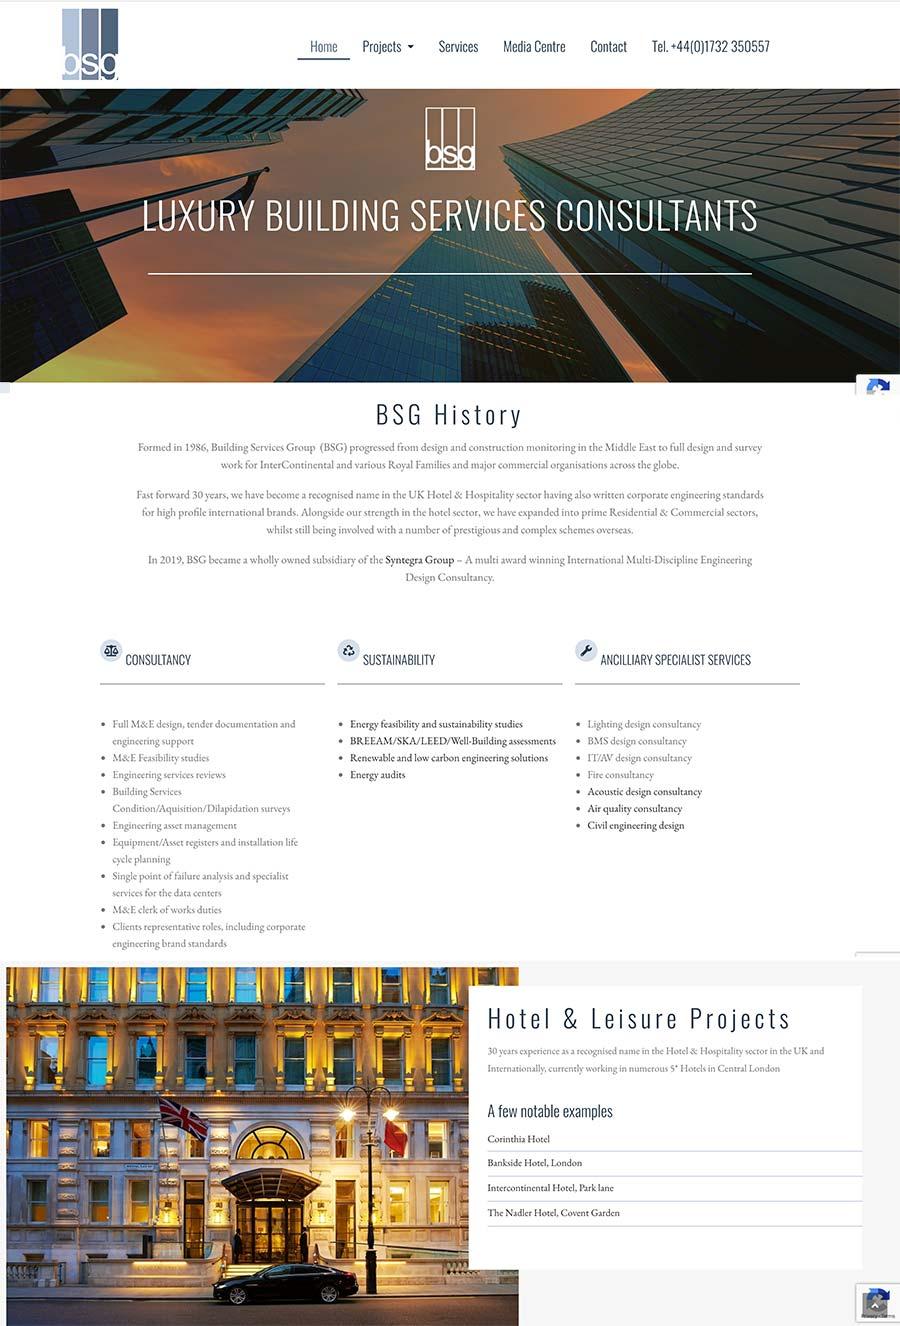 BSG Luxury Building services Consultants